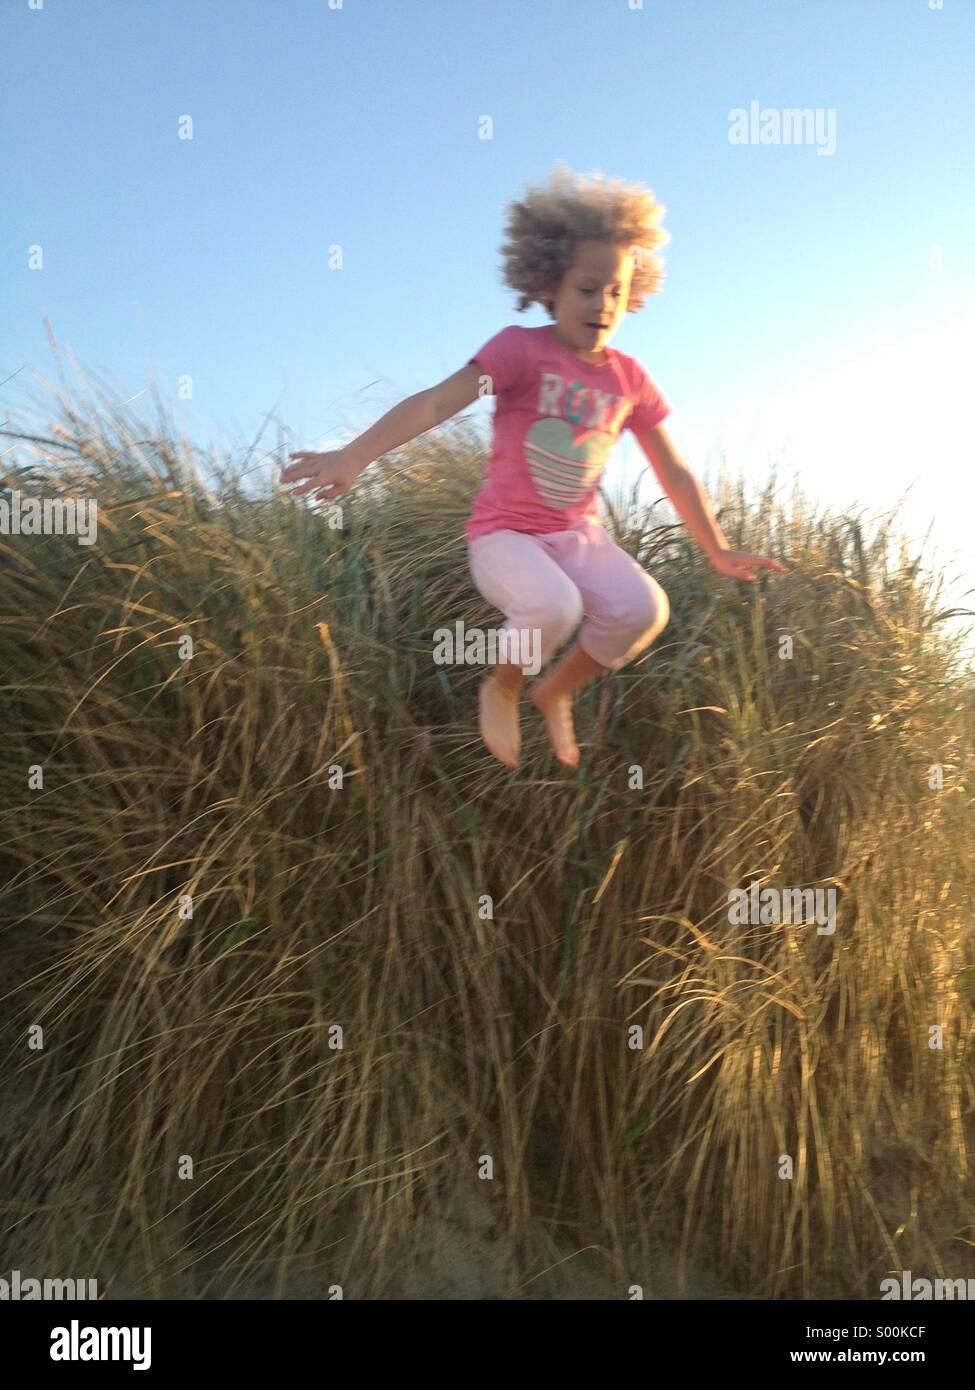 Jumping off sand dune, 7-year old Maya Braibish jumps off sand dune on July 4th. Manzanita, Oregon Coast - Stock Image